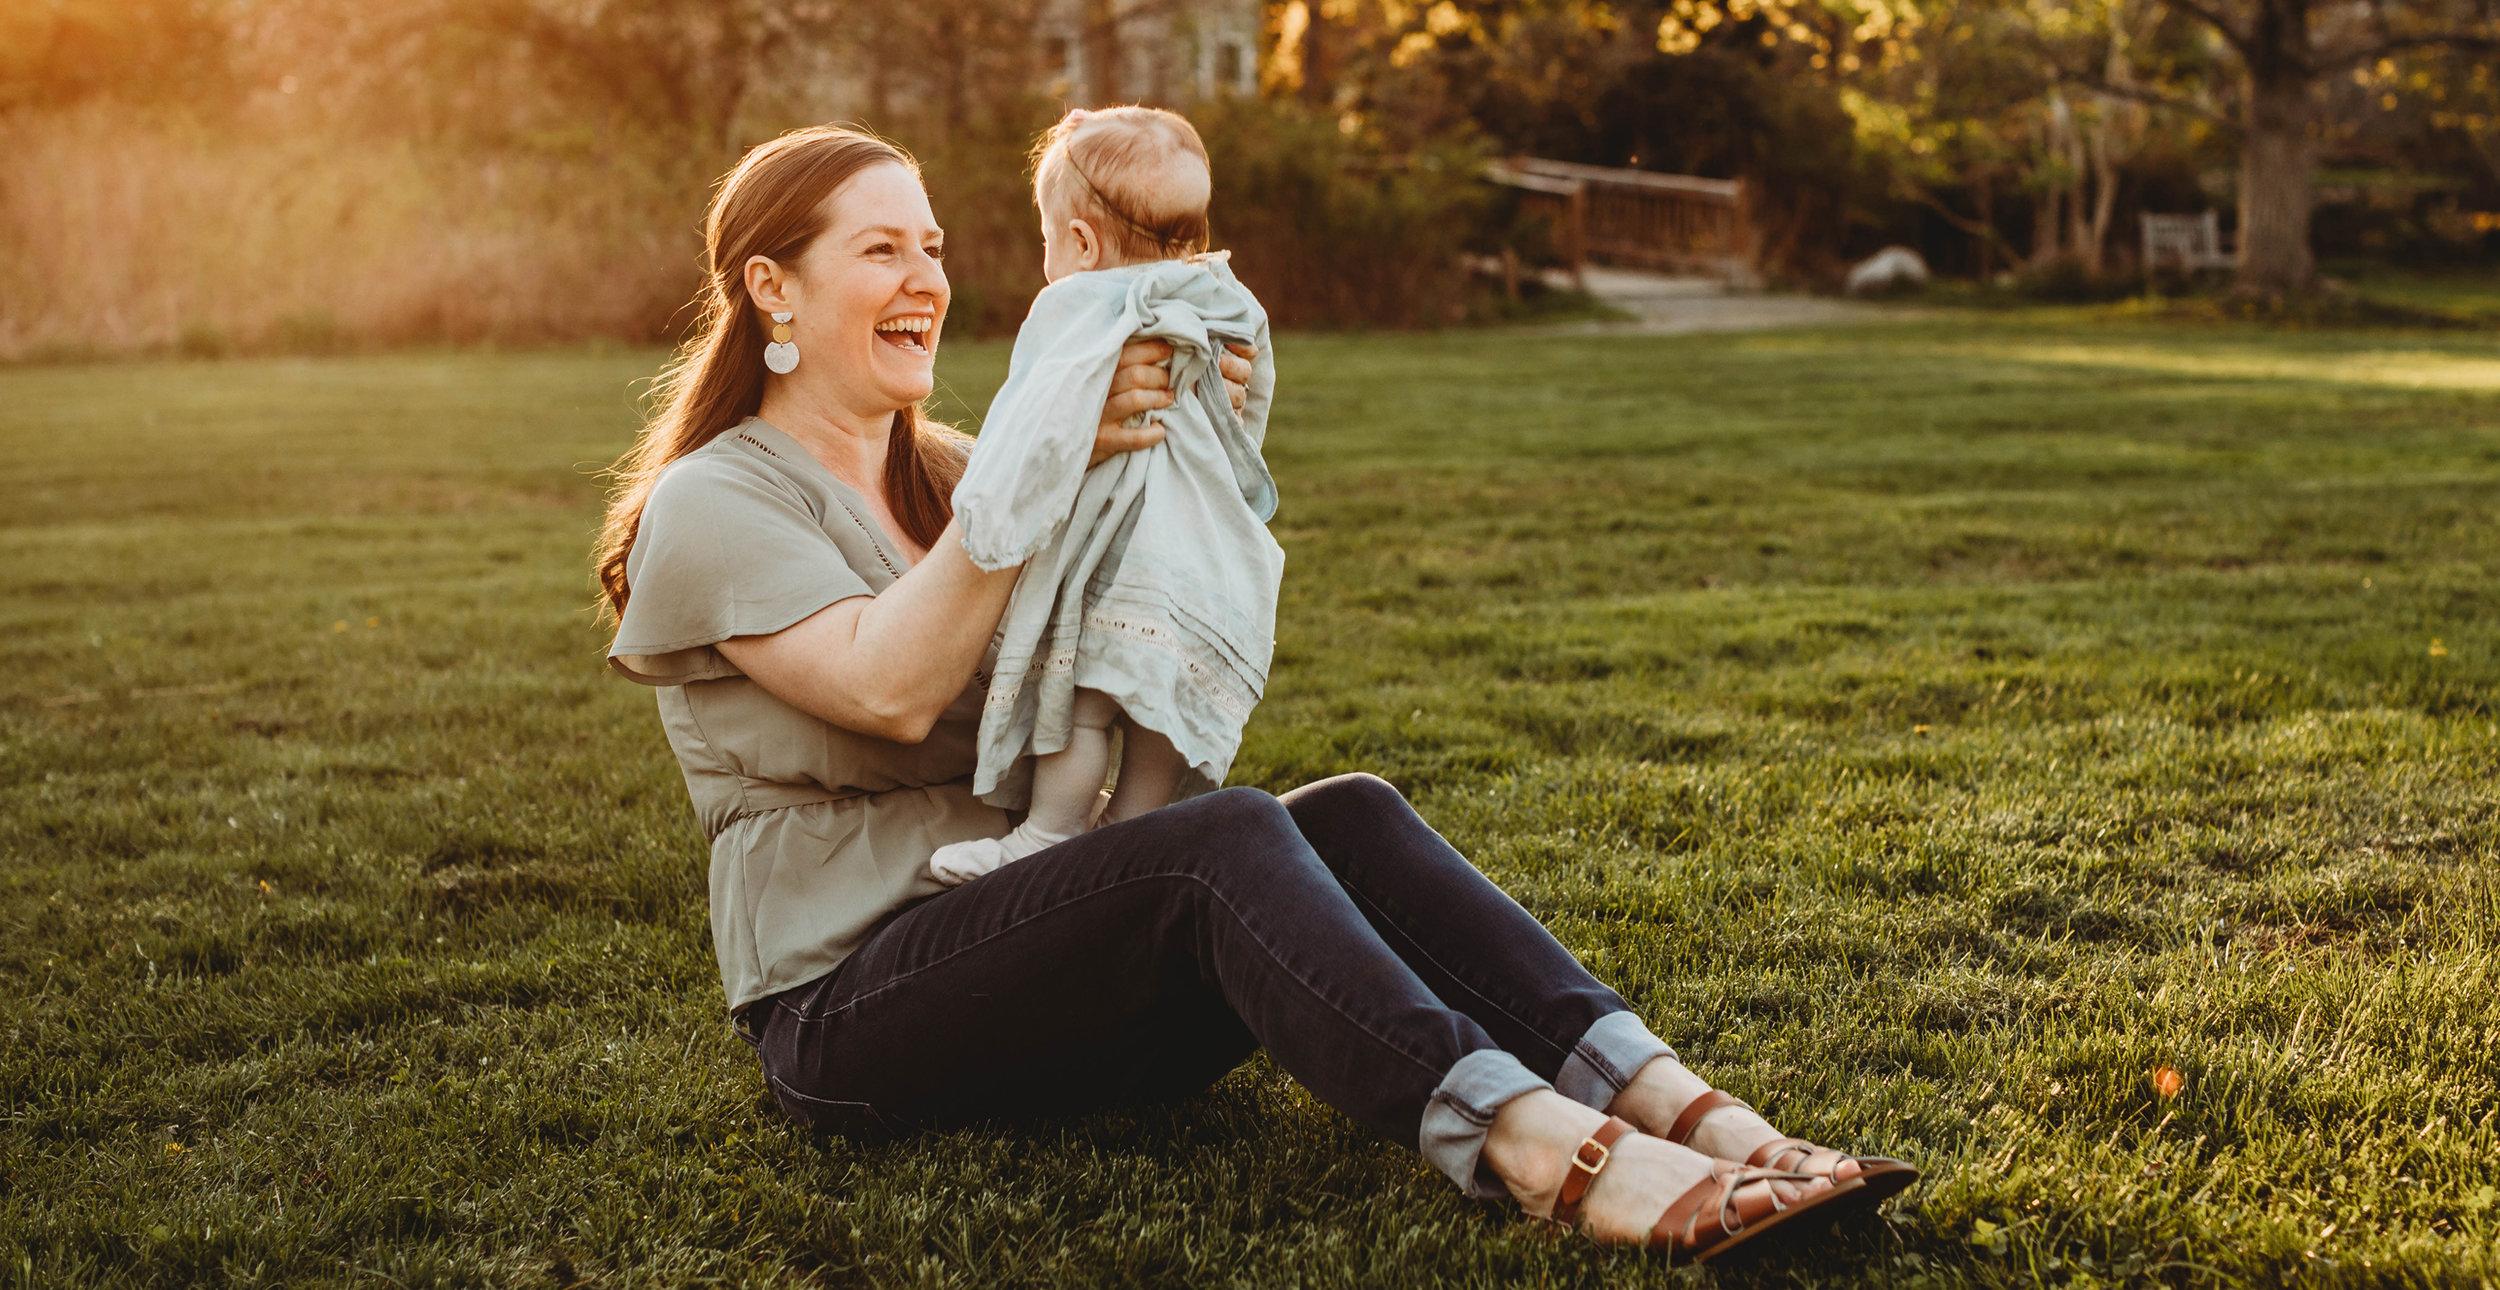 joyleducphotography-bostonfamilyphotographer-lifestyleportraiture-12.jpg